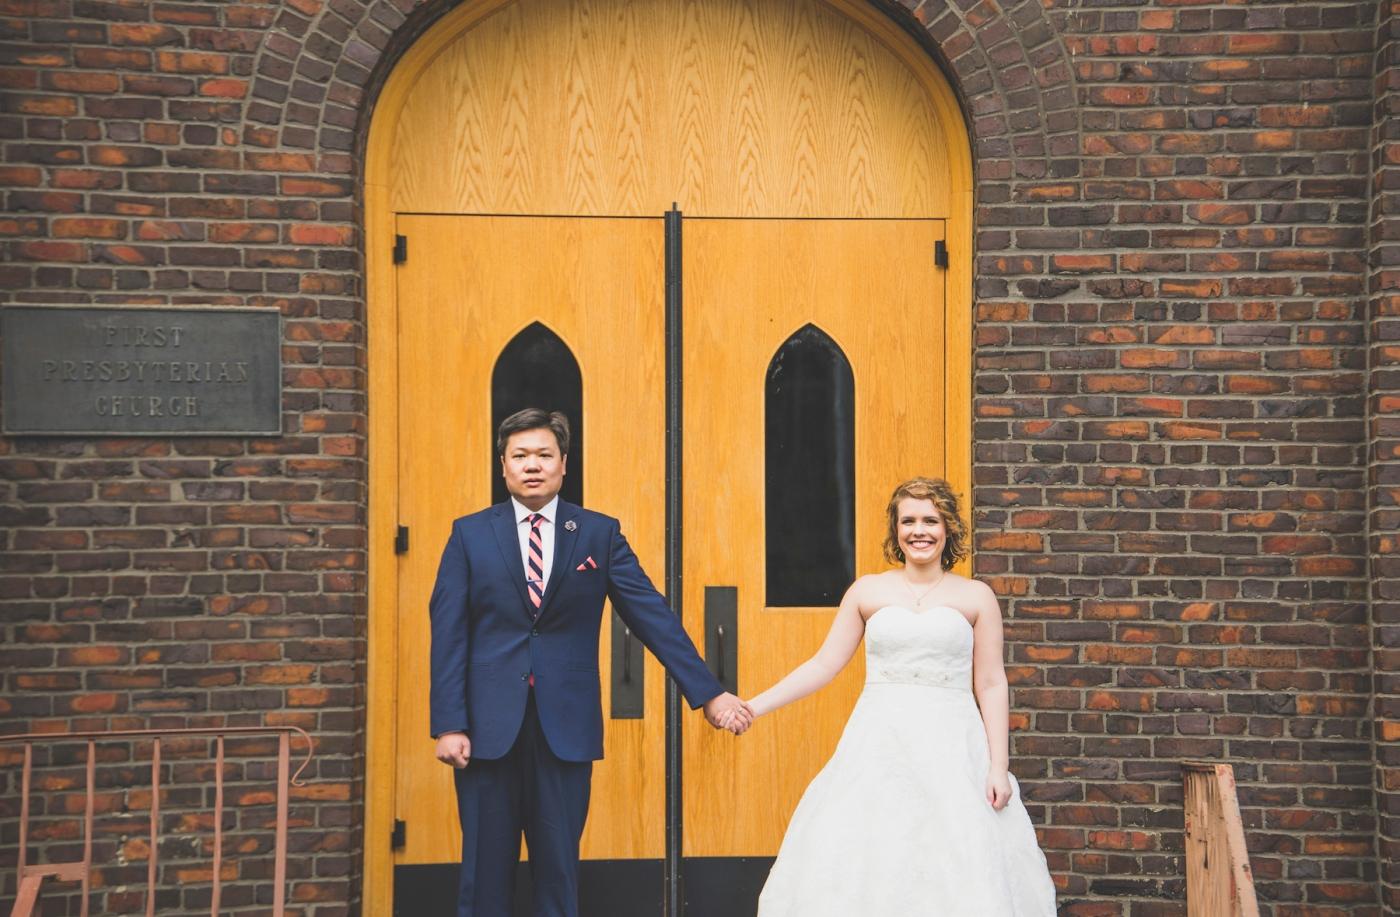 DSC_2210Everett_Wedding_Ballroom_Jane_Speleers_photography_Rachel_and_Edmund_Bridesmaids_peach_dresses_groomsmen_2017